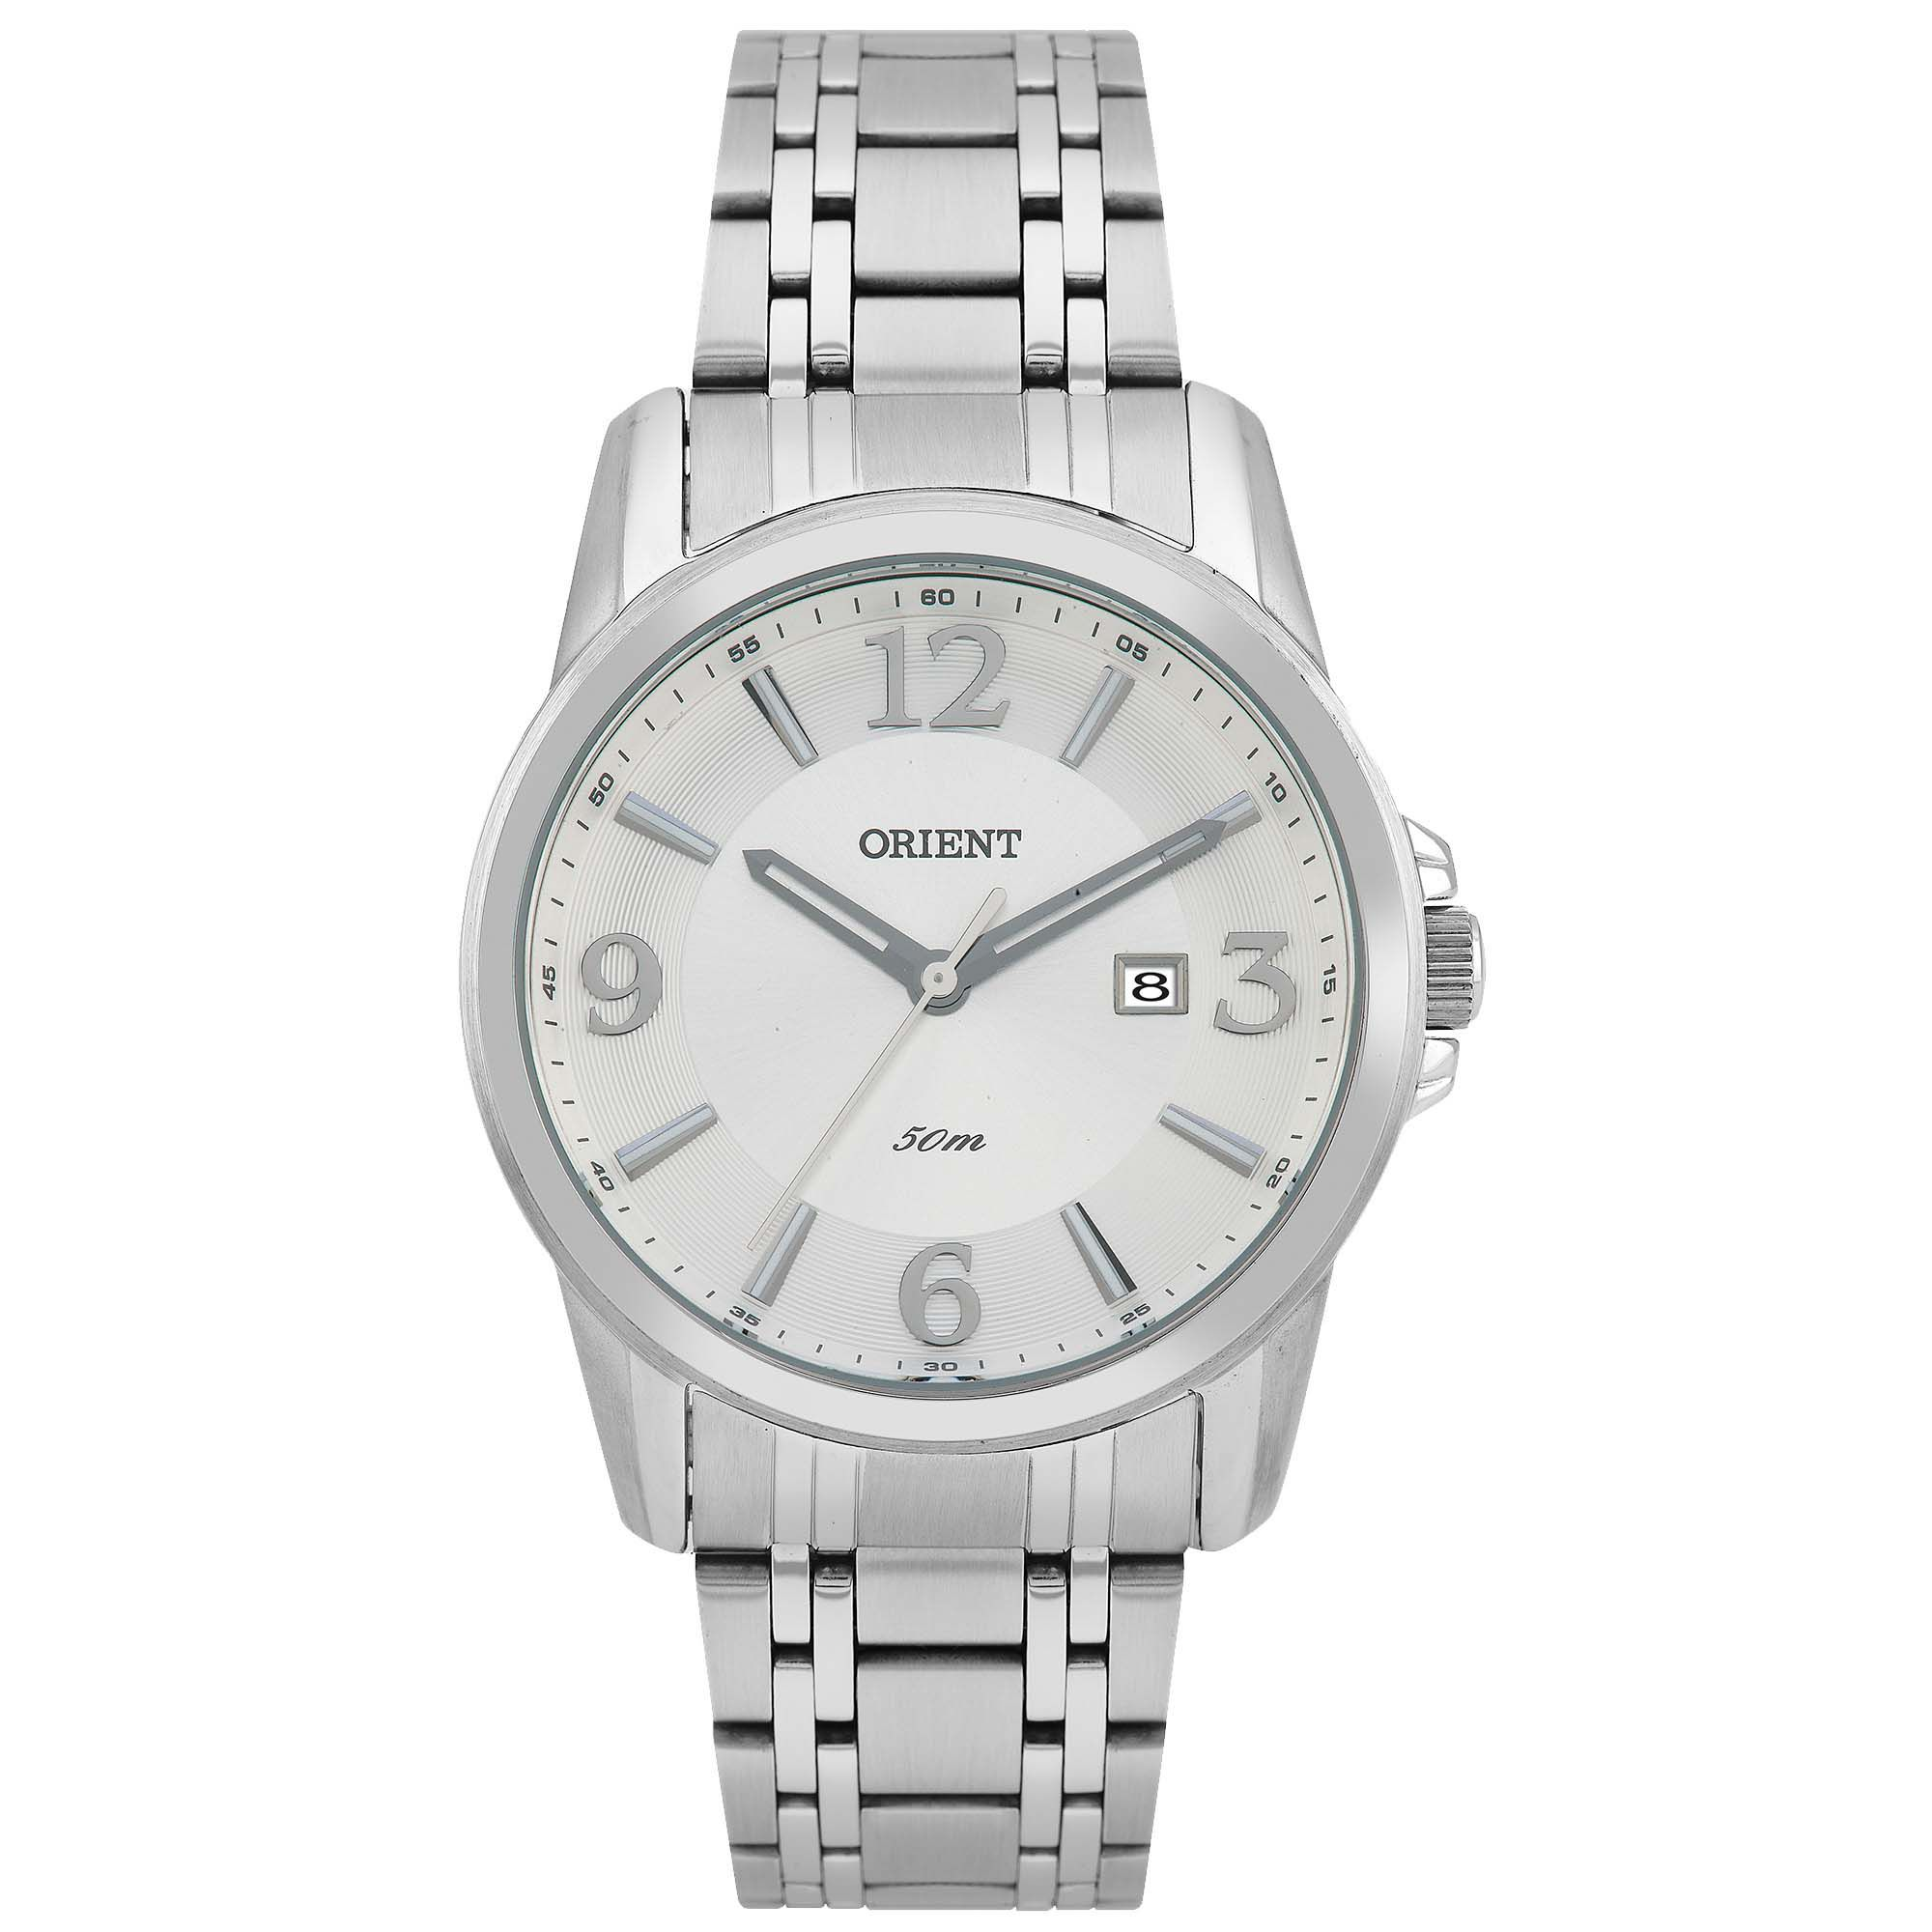 Relógio Masculino Orient MBSS1215 S2SX